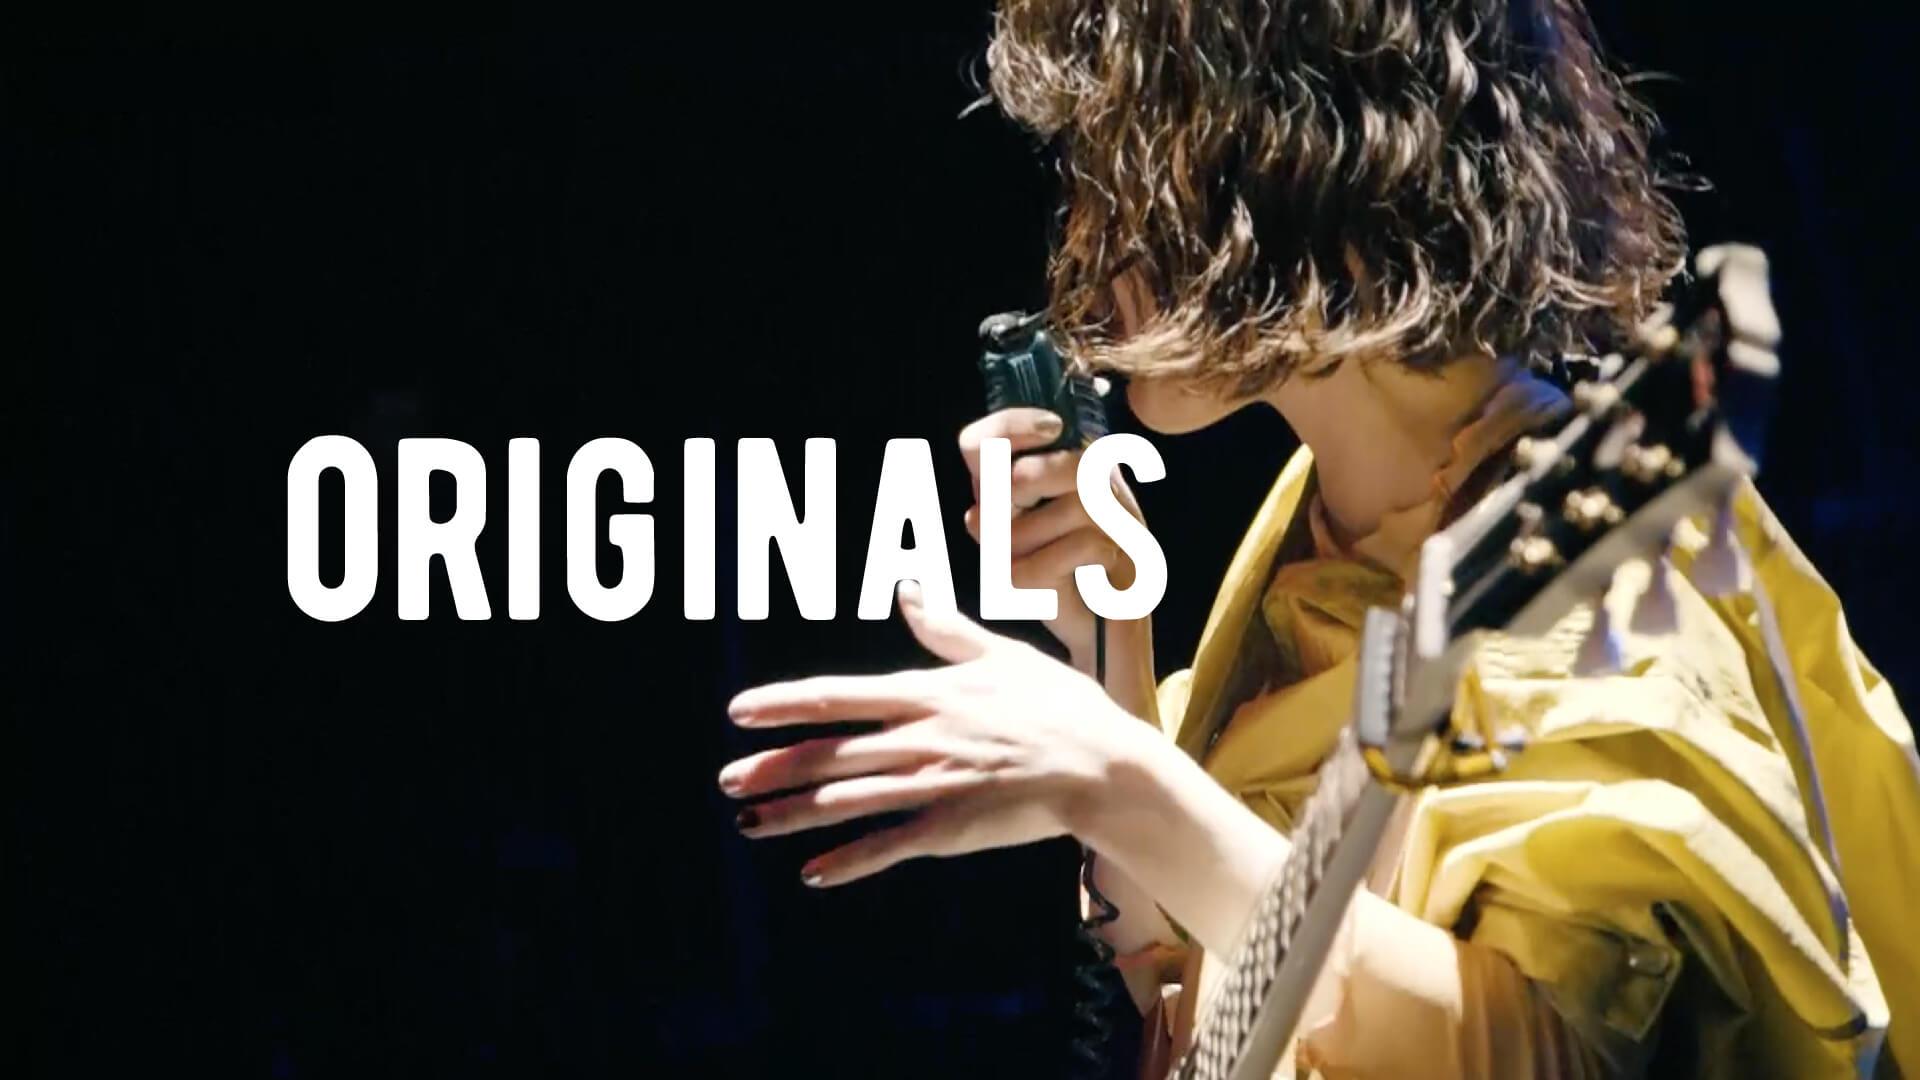 Reiのニューアルバム『HONEY』リリースツアーの六本木公演より全3曲のライブ映像が公開! music210428_rei_live_1